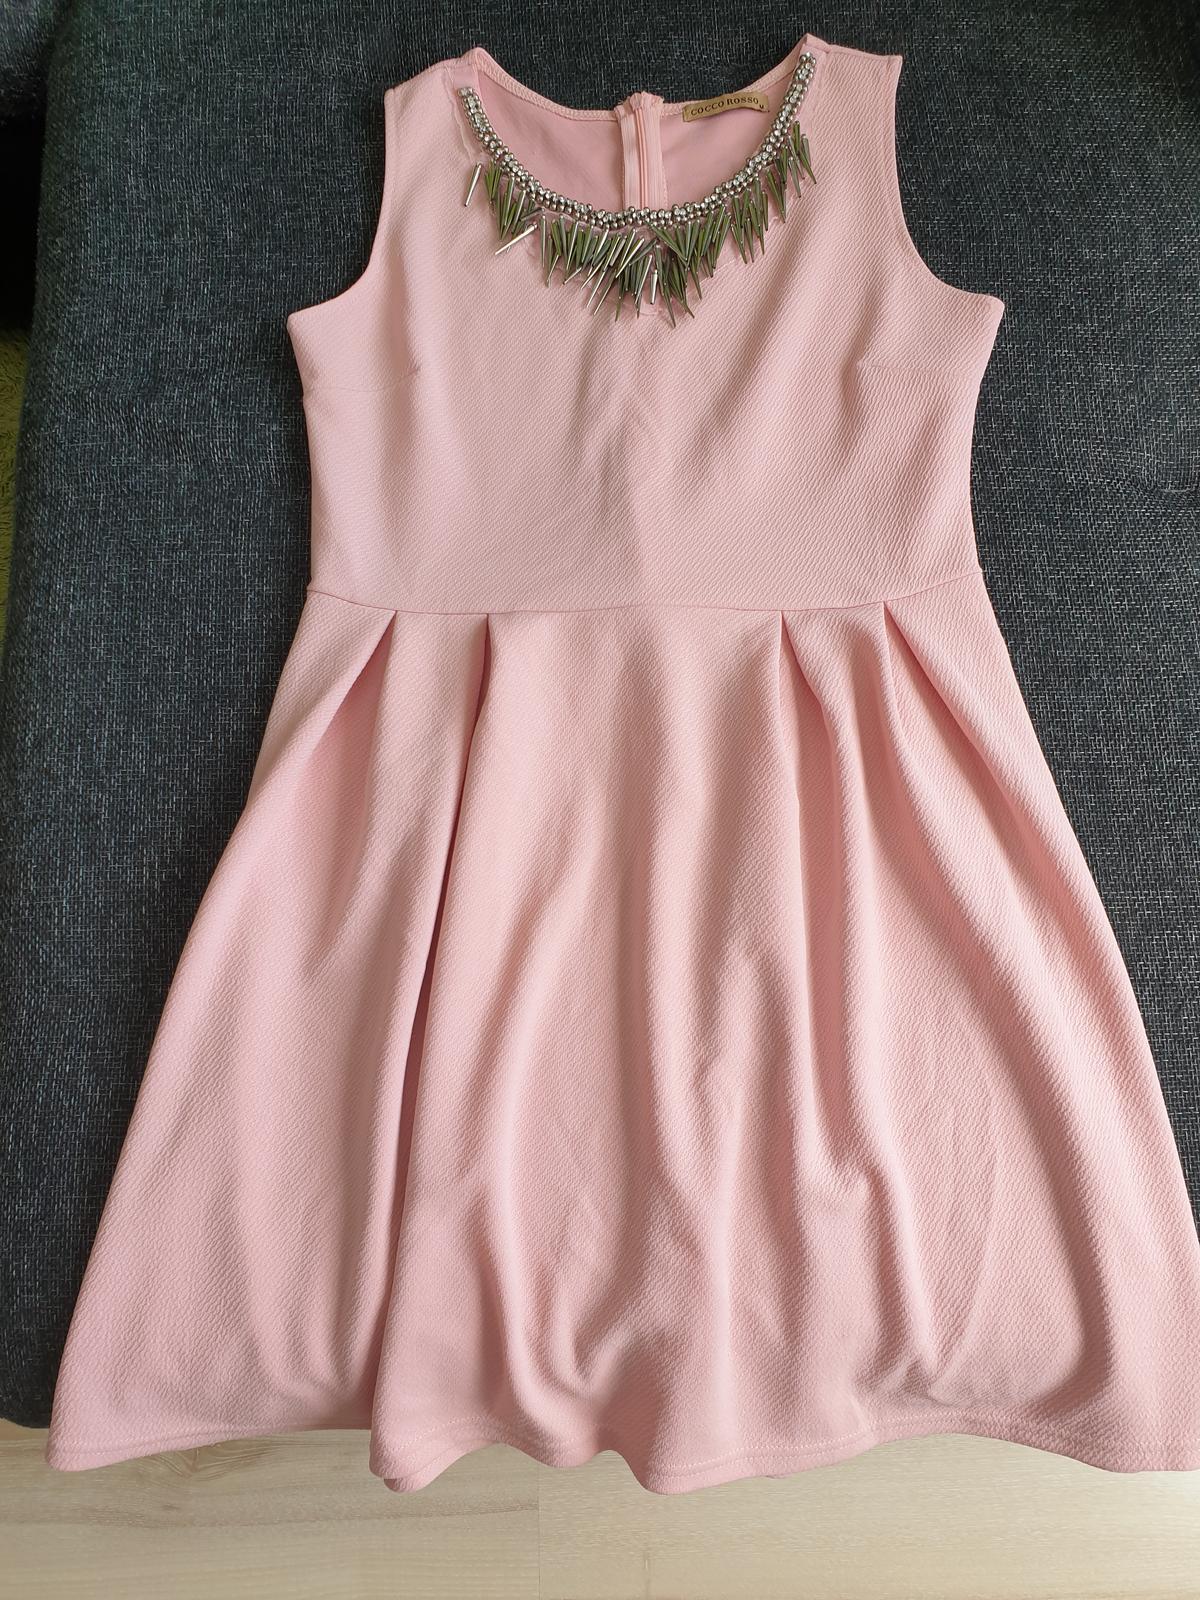 Ružové šaty s náhrdelníkom M - Obrázok č. 1